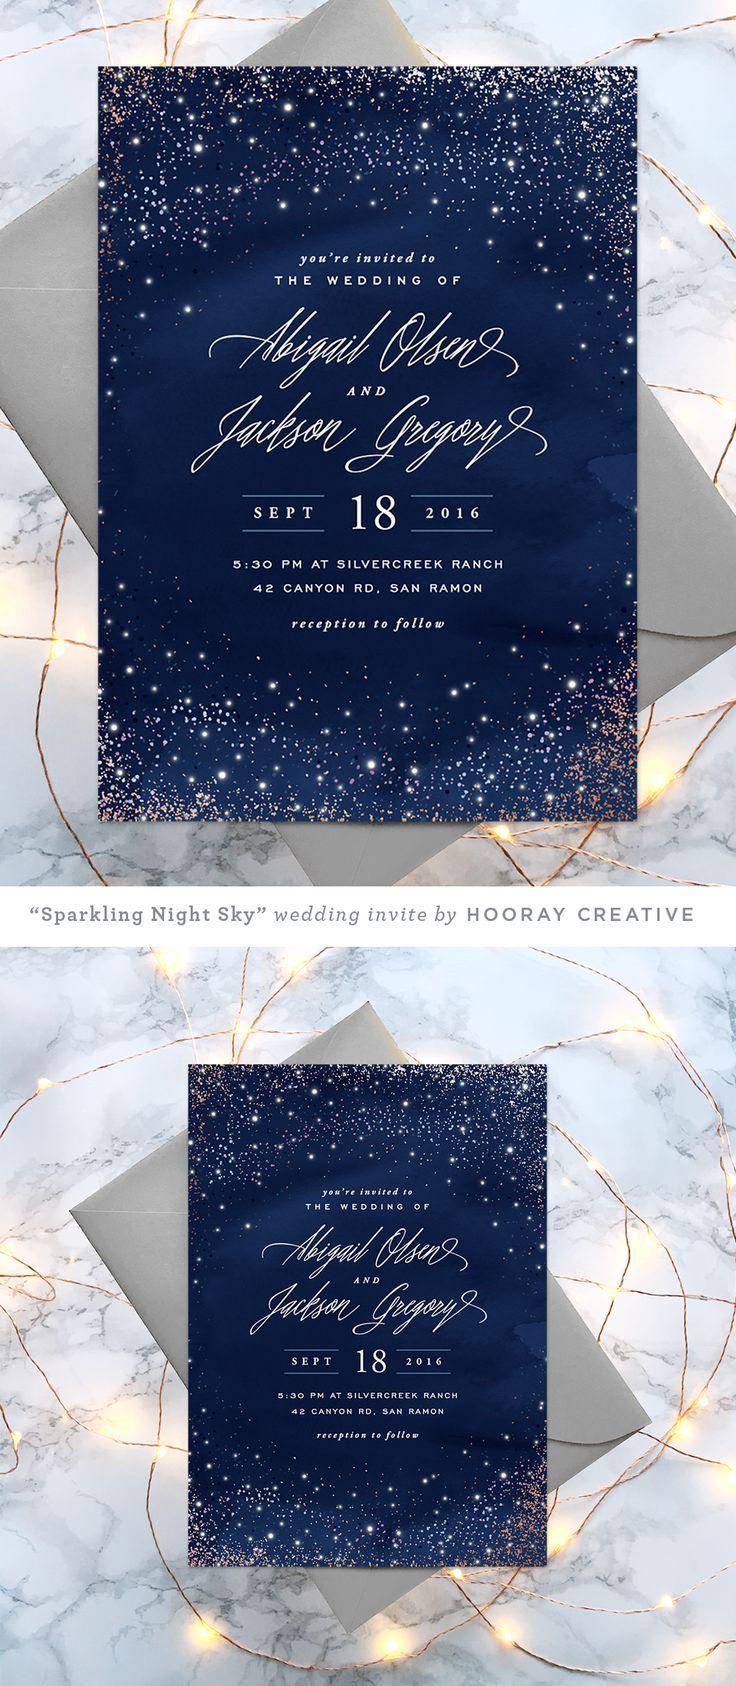 Sparkling Night Sky starry wedding invitation | design and ...